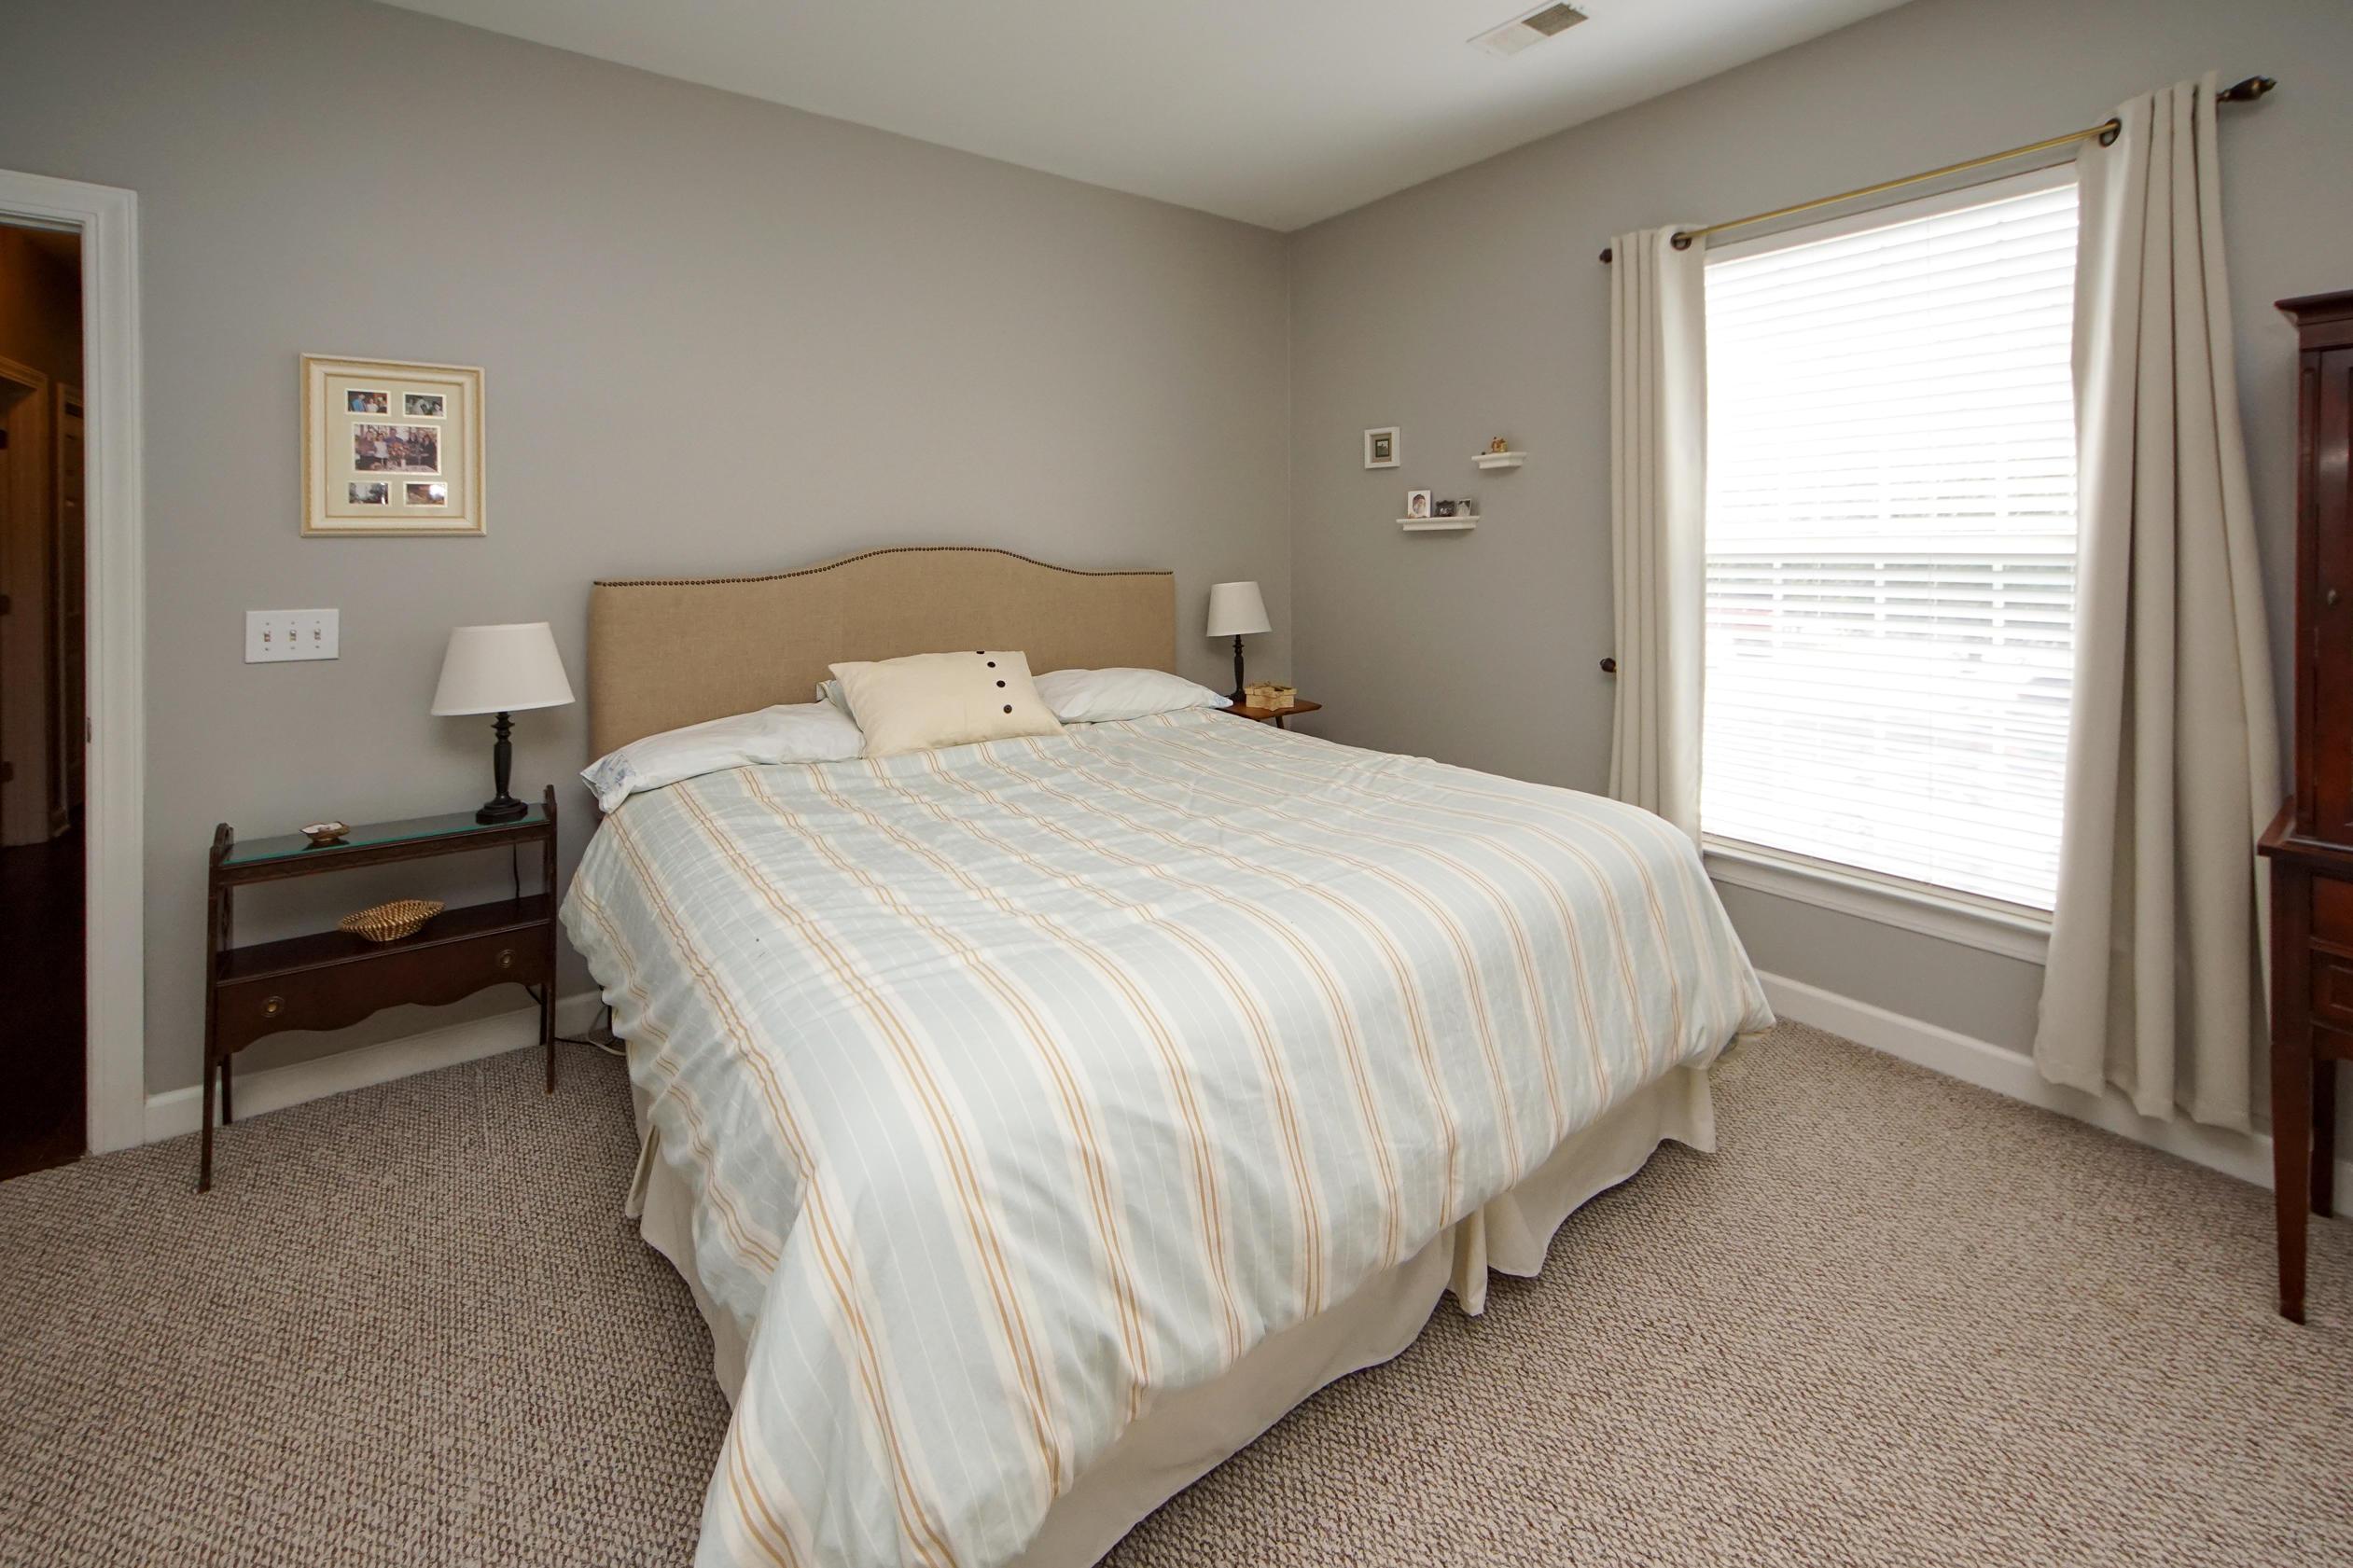 Dunes West Homes For Sale - 1631 Camfield, Mount Pleasant, SC - 27